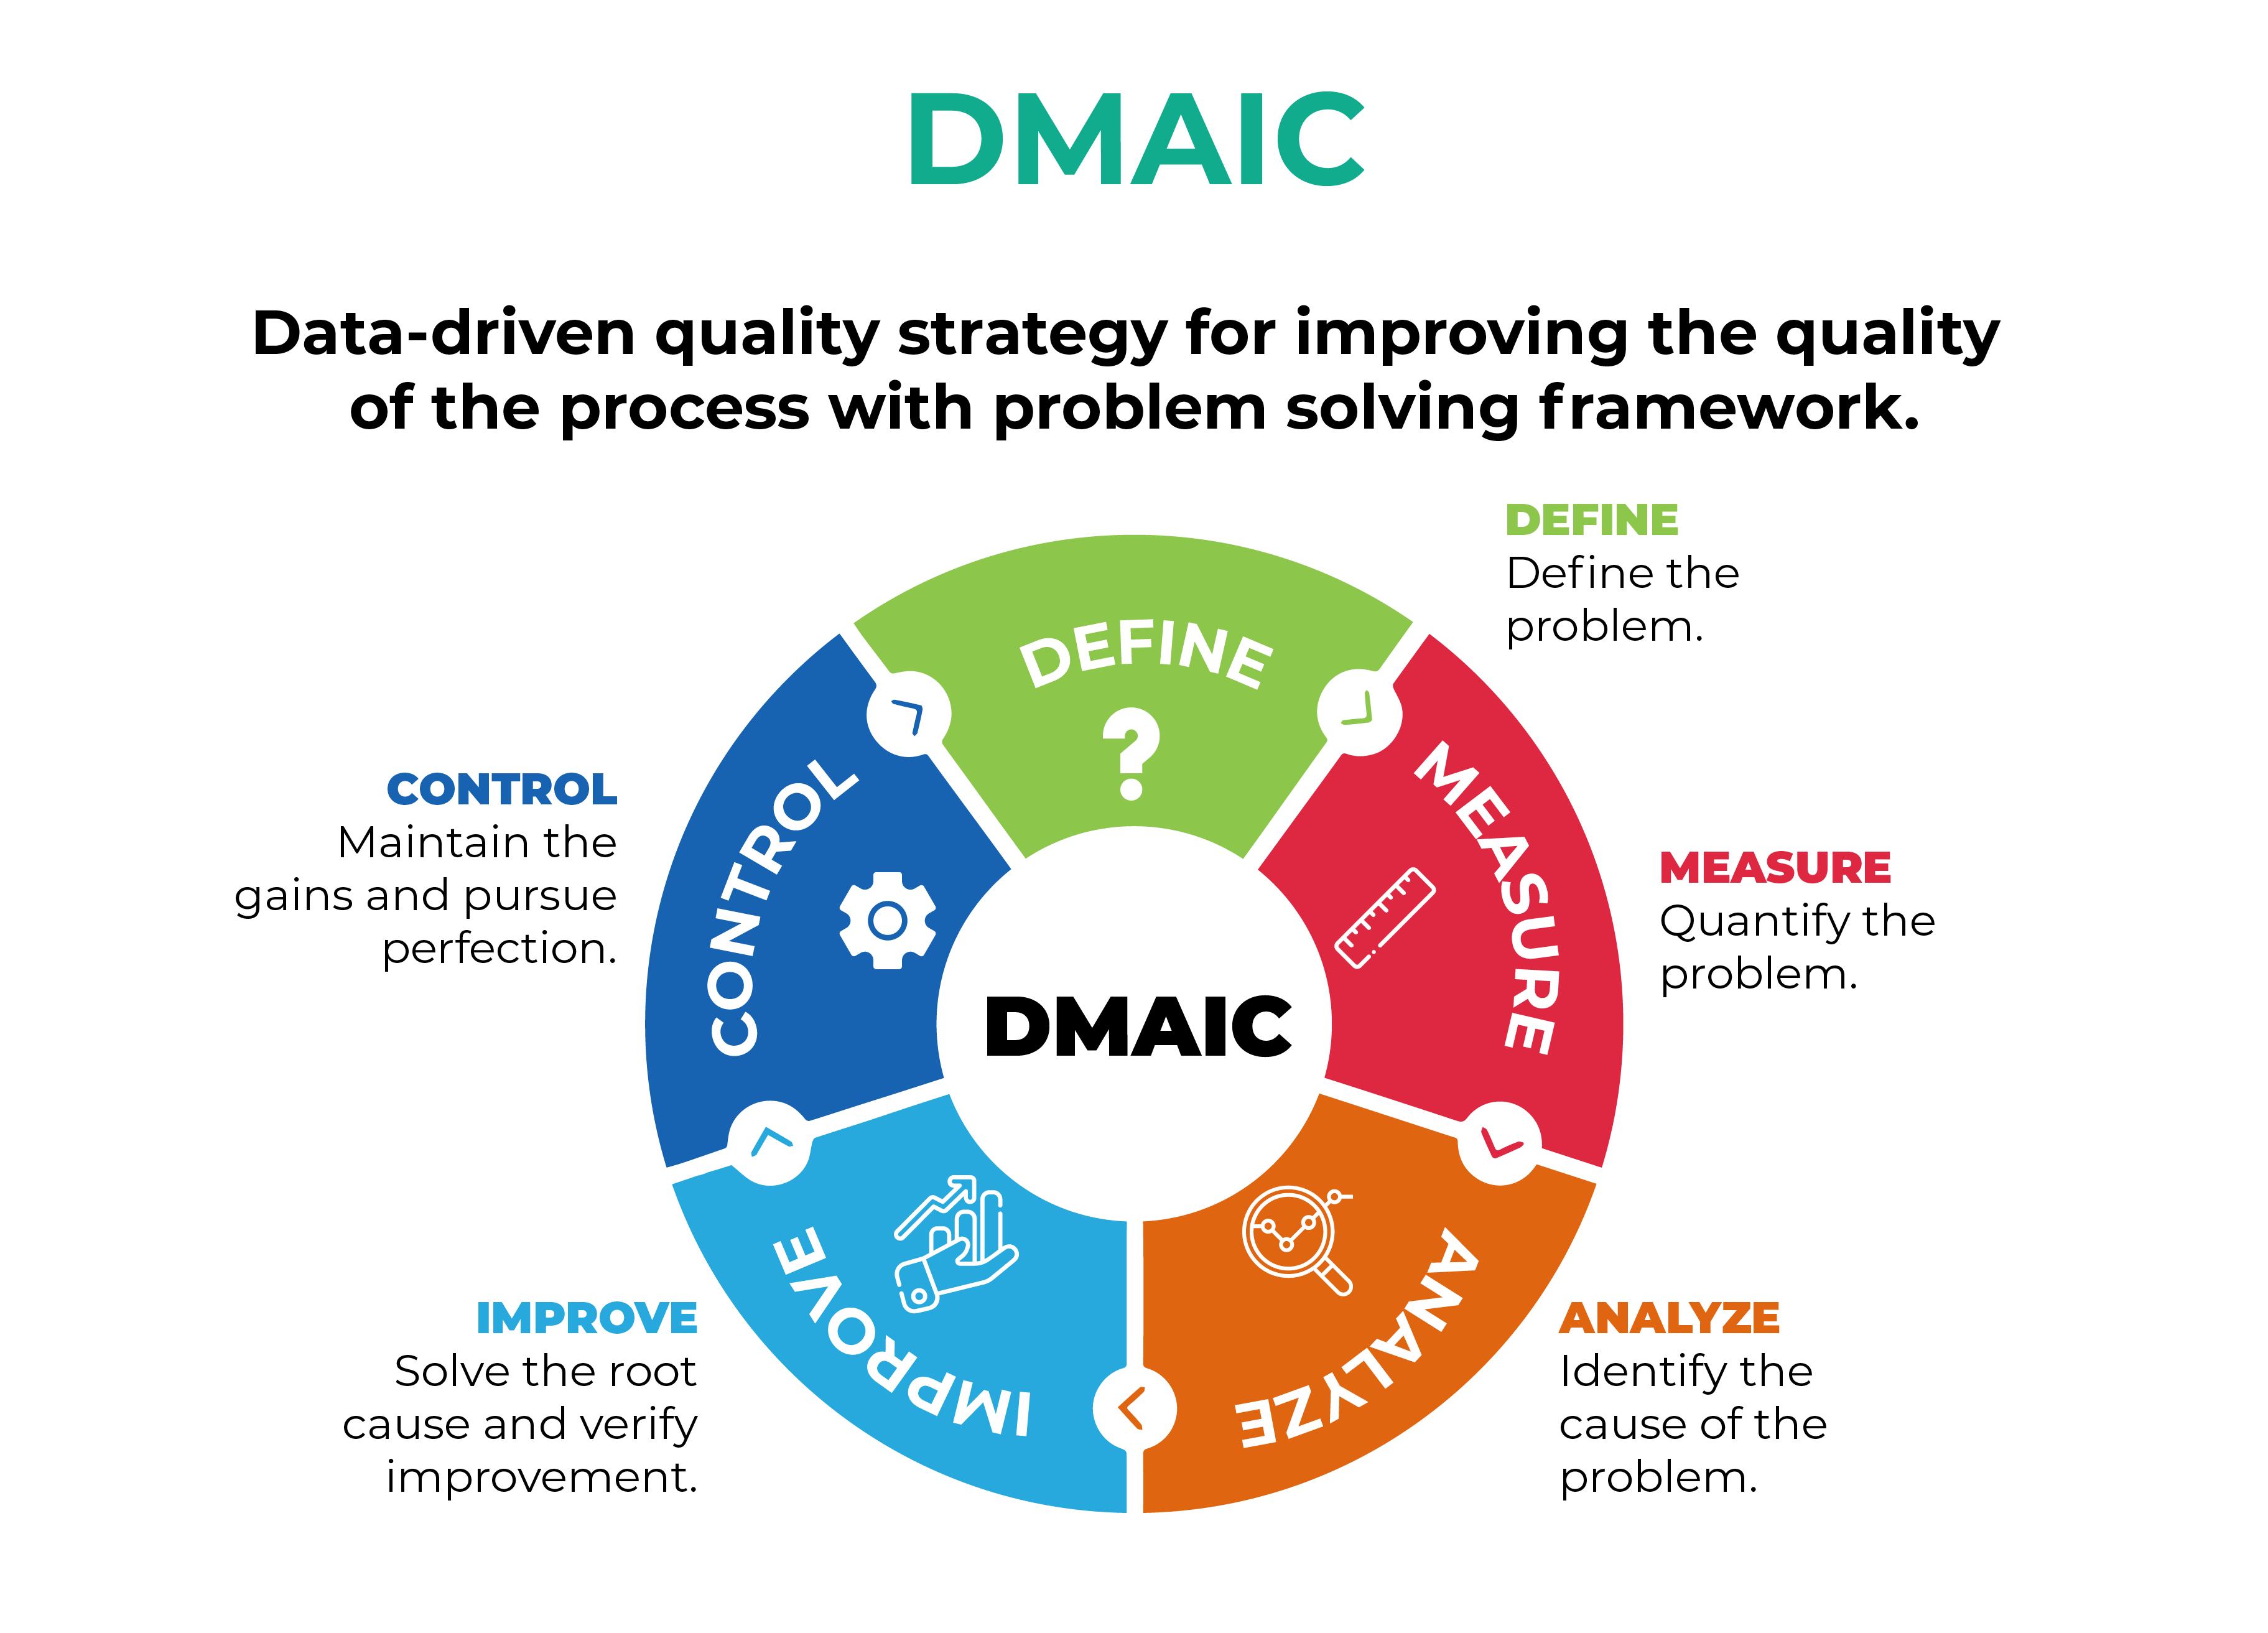 DMAIC acronym